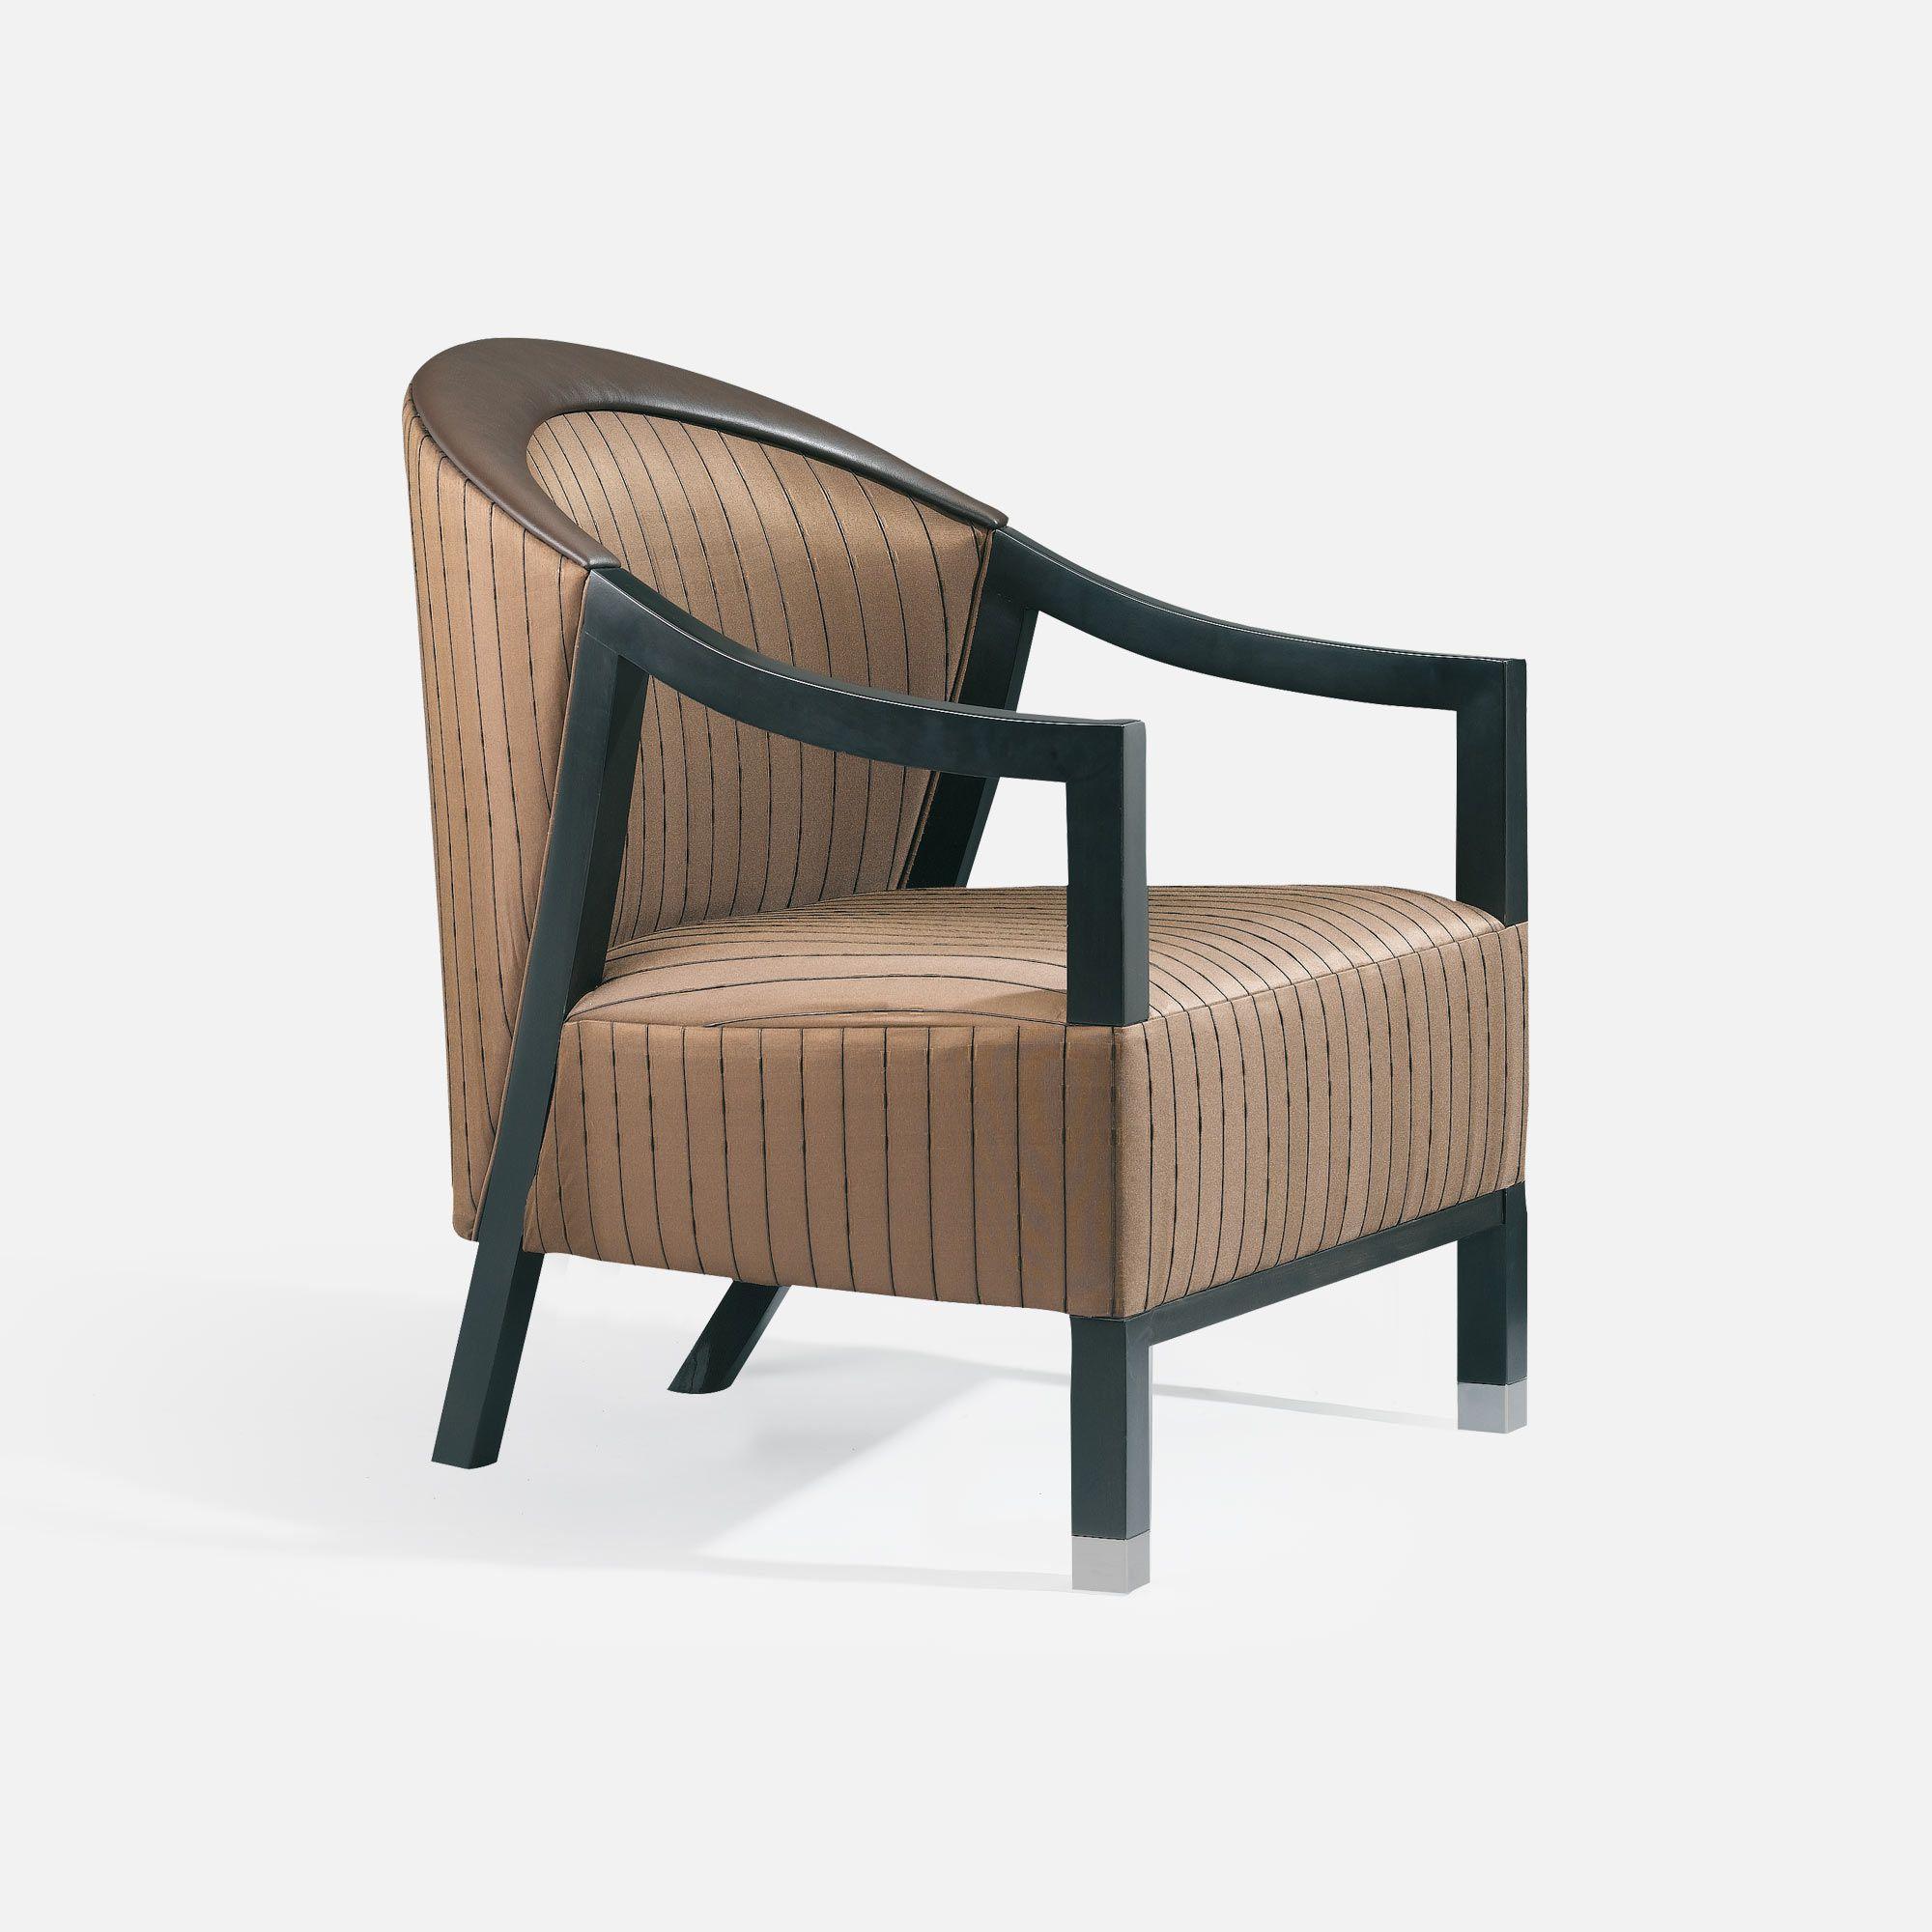 Luxe Design Fauteuil.Fauteuil Luxe Claude Robin Pour Bar Restaurant Hotel Collinet